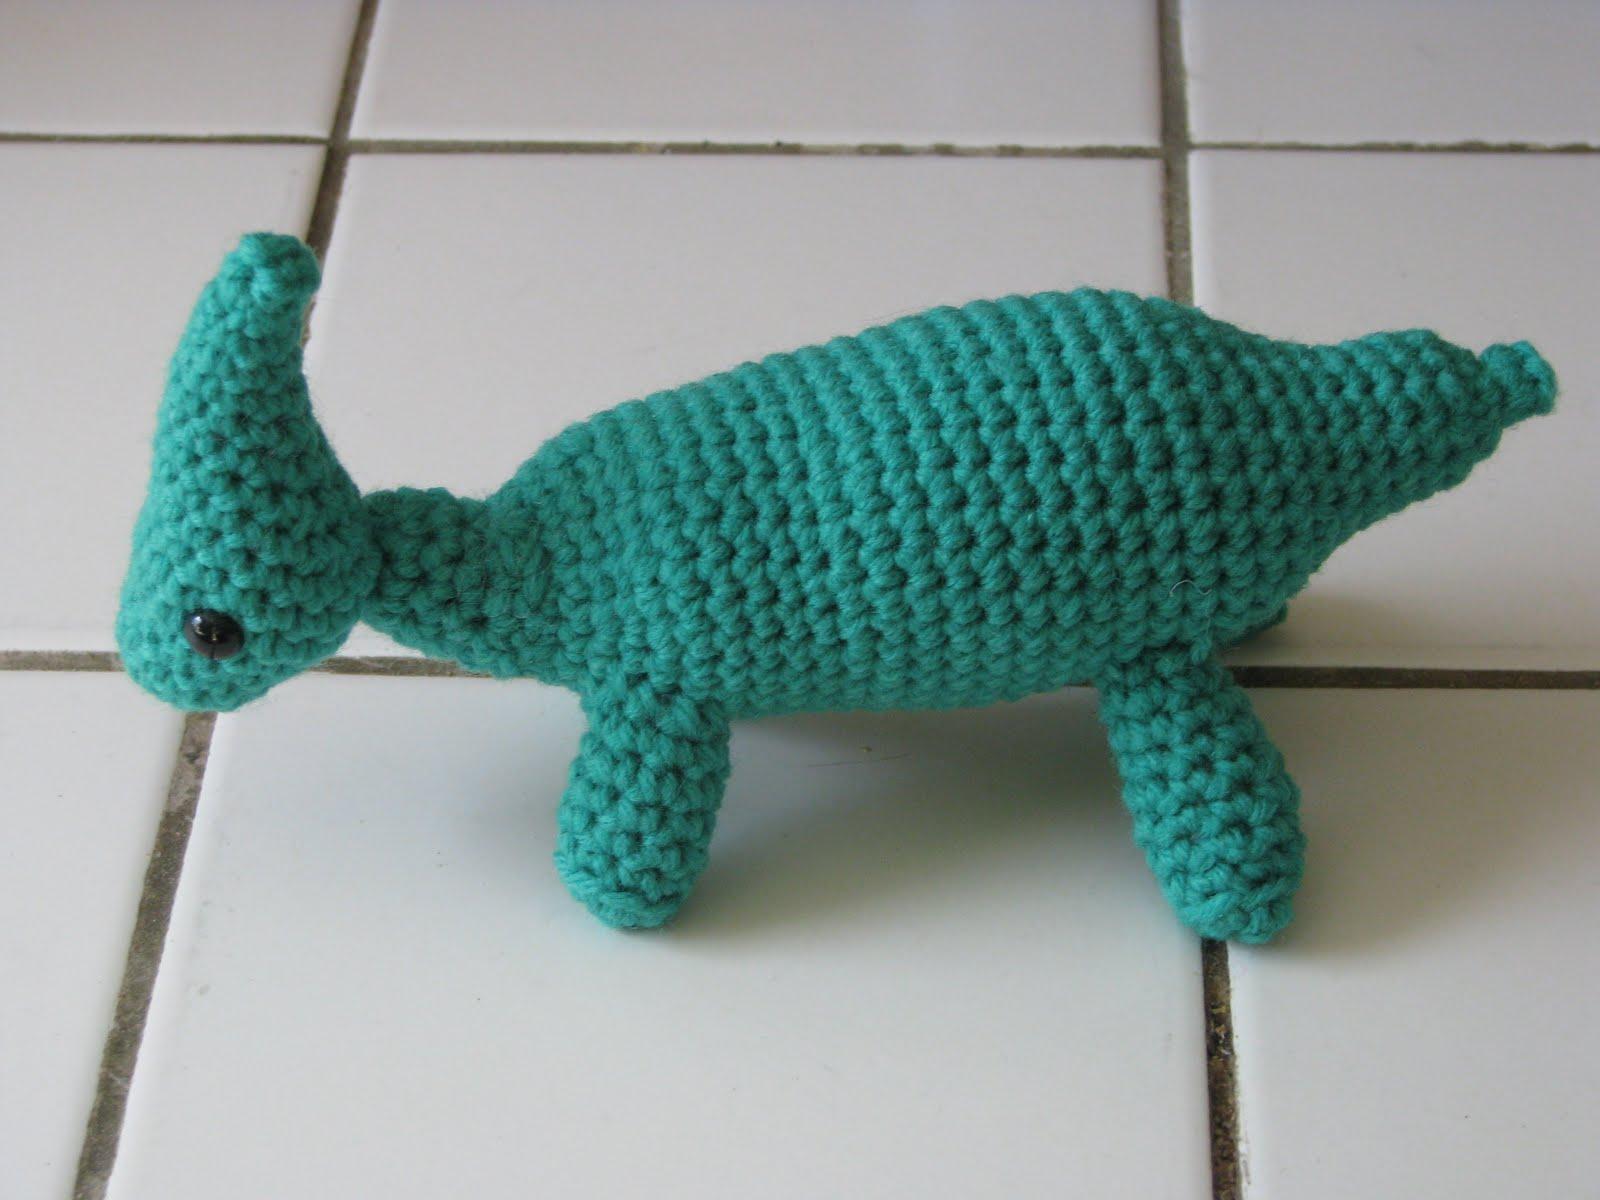 Gourmet Crochet Amigurumi Dinosaurs : Craft Attic Resources: Parasaurolophus